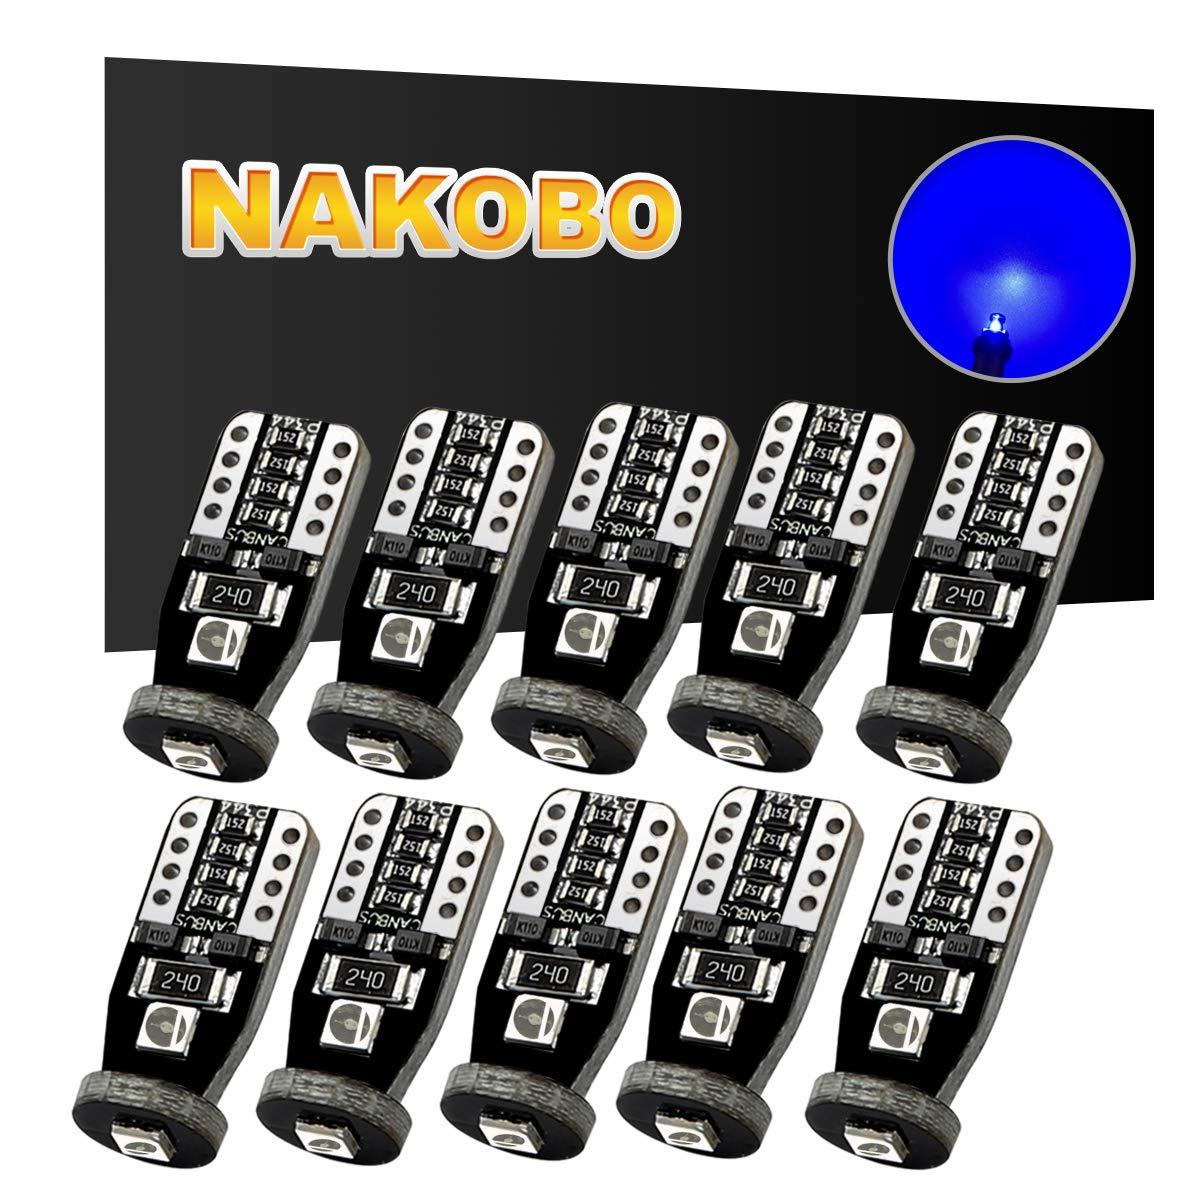 Nakobo 1500 Lumen 7443 7440 7441 7444NA T20Led Bulb for Brake Back up RV Tail Lights Smart IC 27SMD Newest 3030 Chips 12-24V Pure Red, Pack of 2